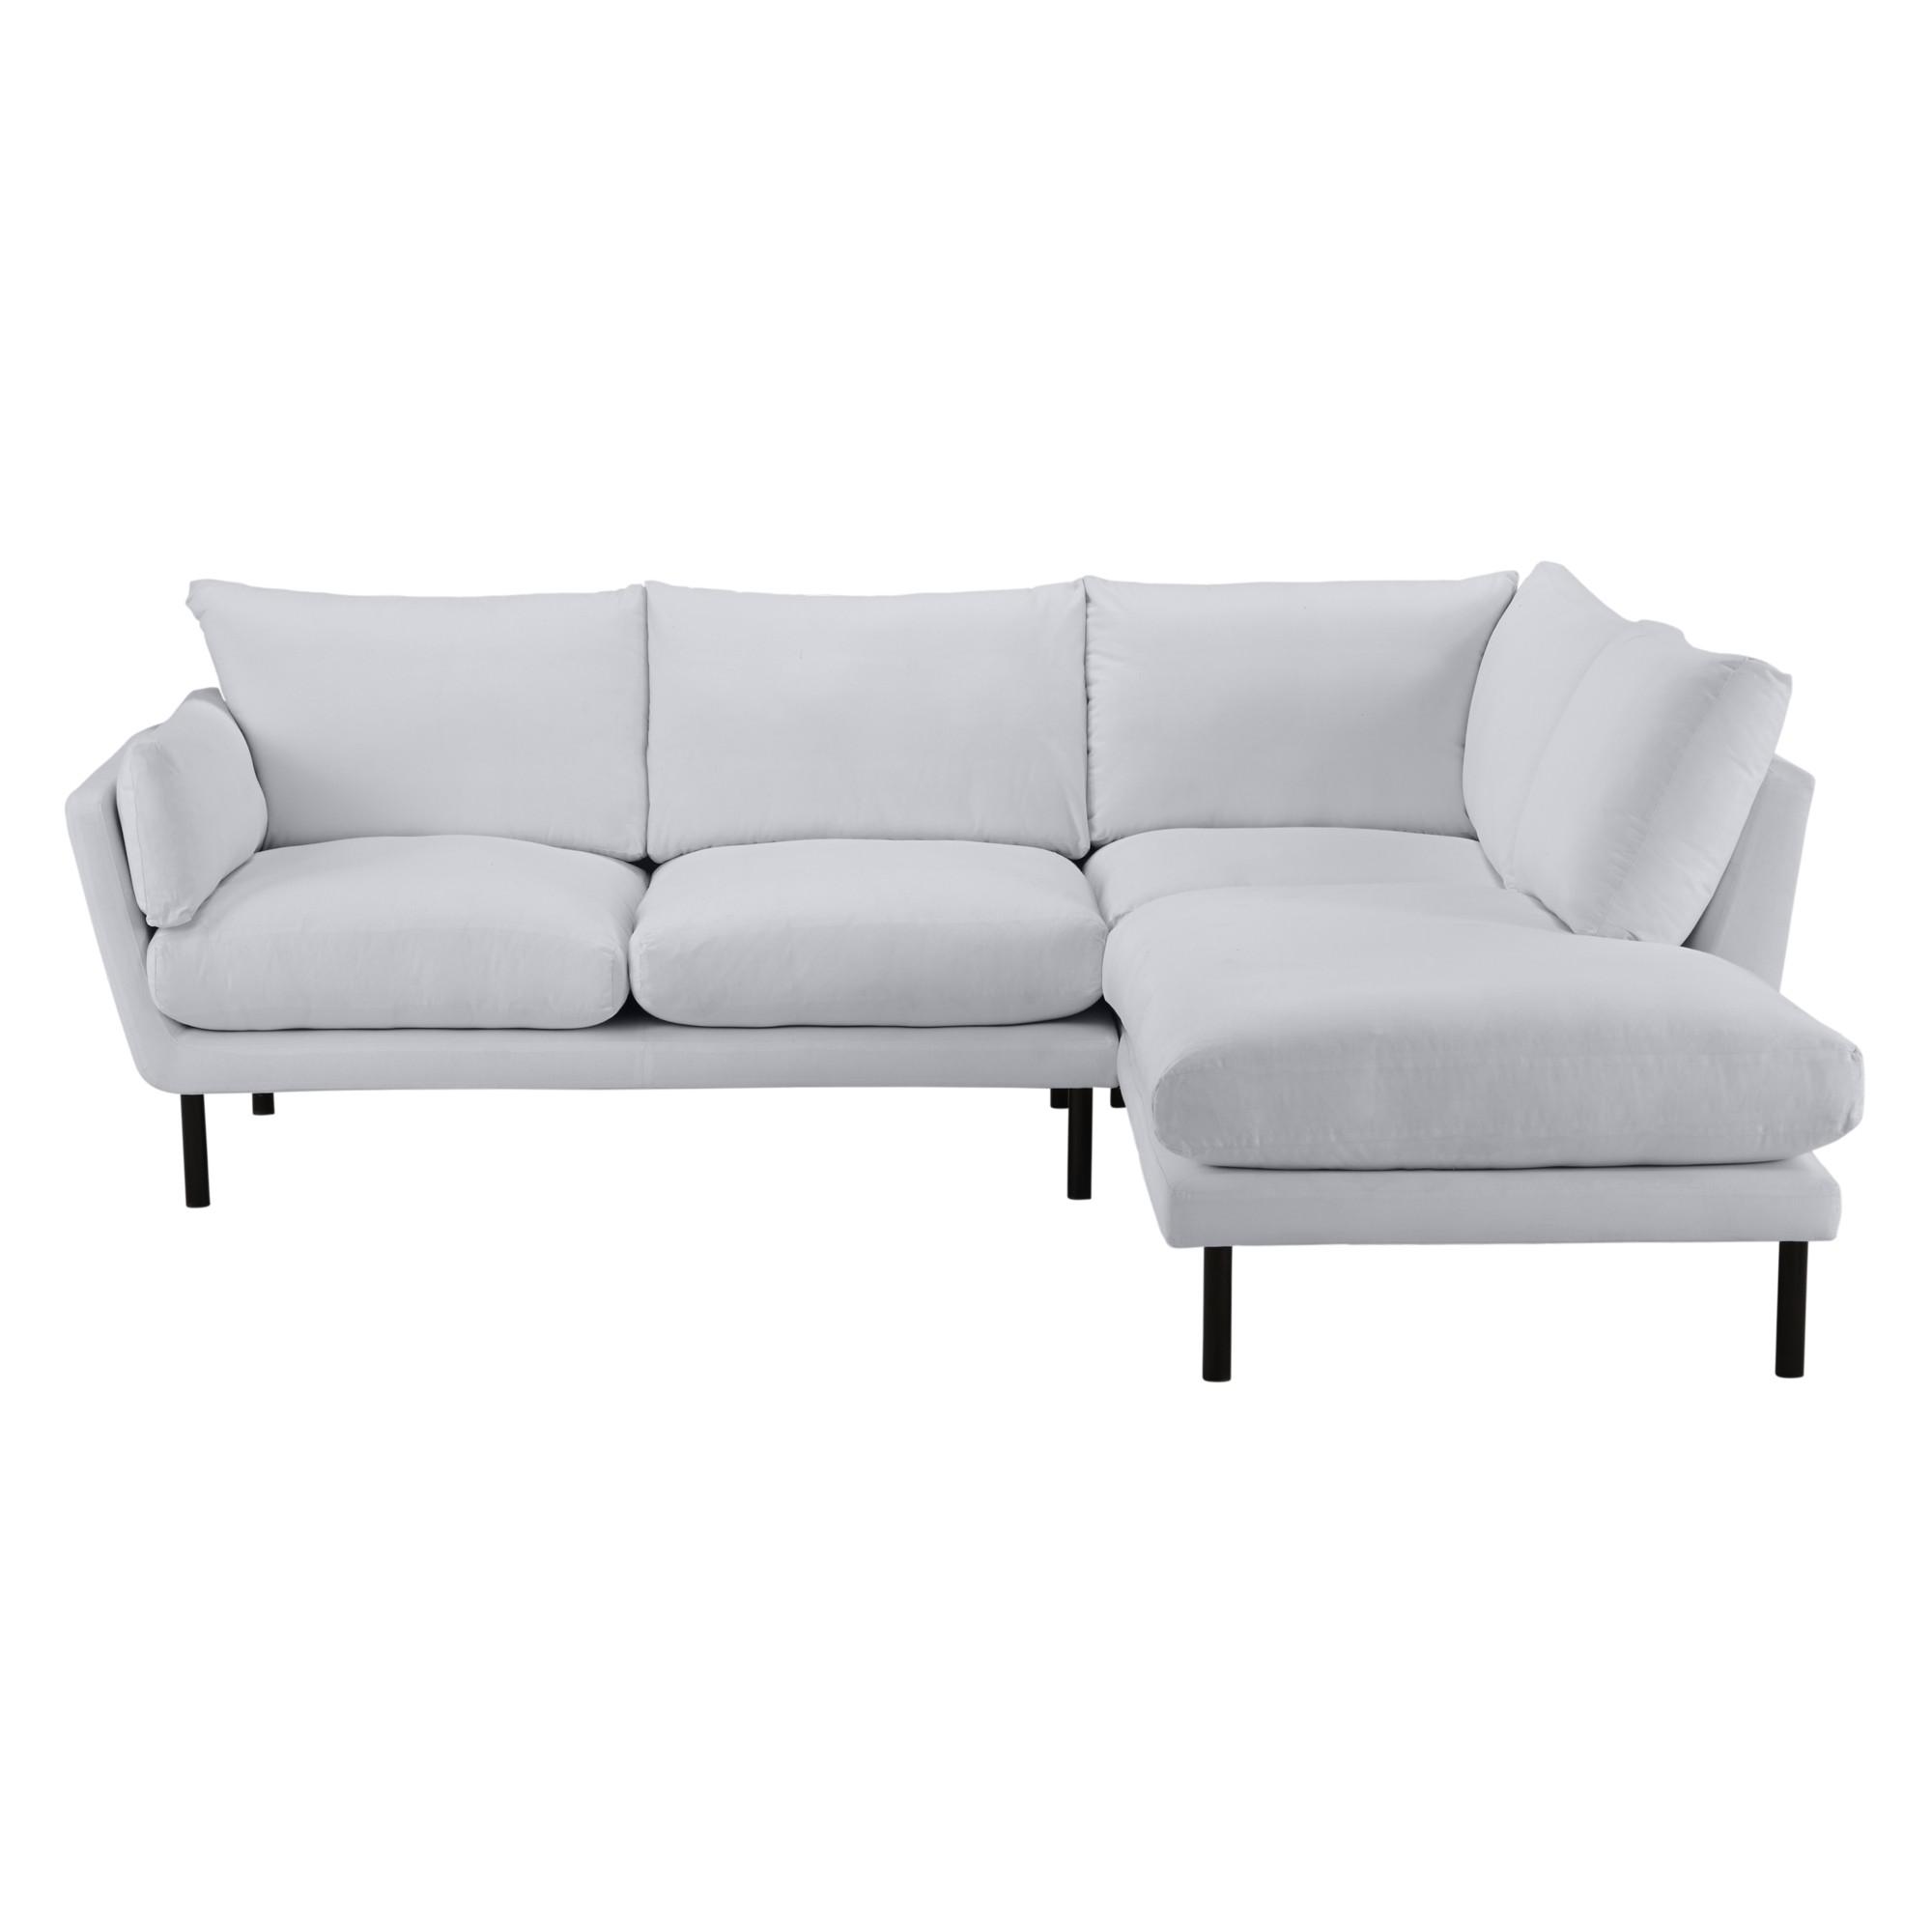 John Lewis Loki Medium RHF Corner Chaise End Sofa